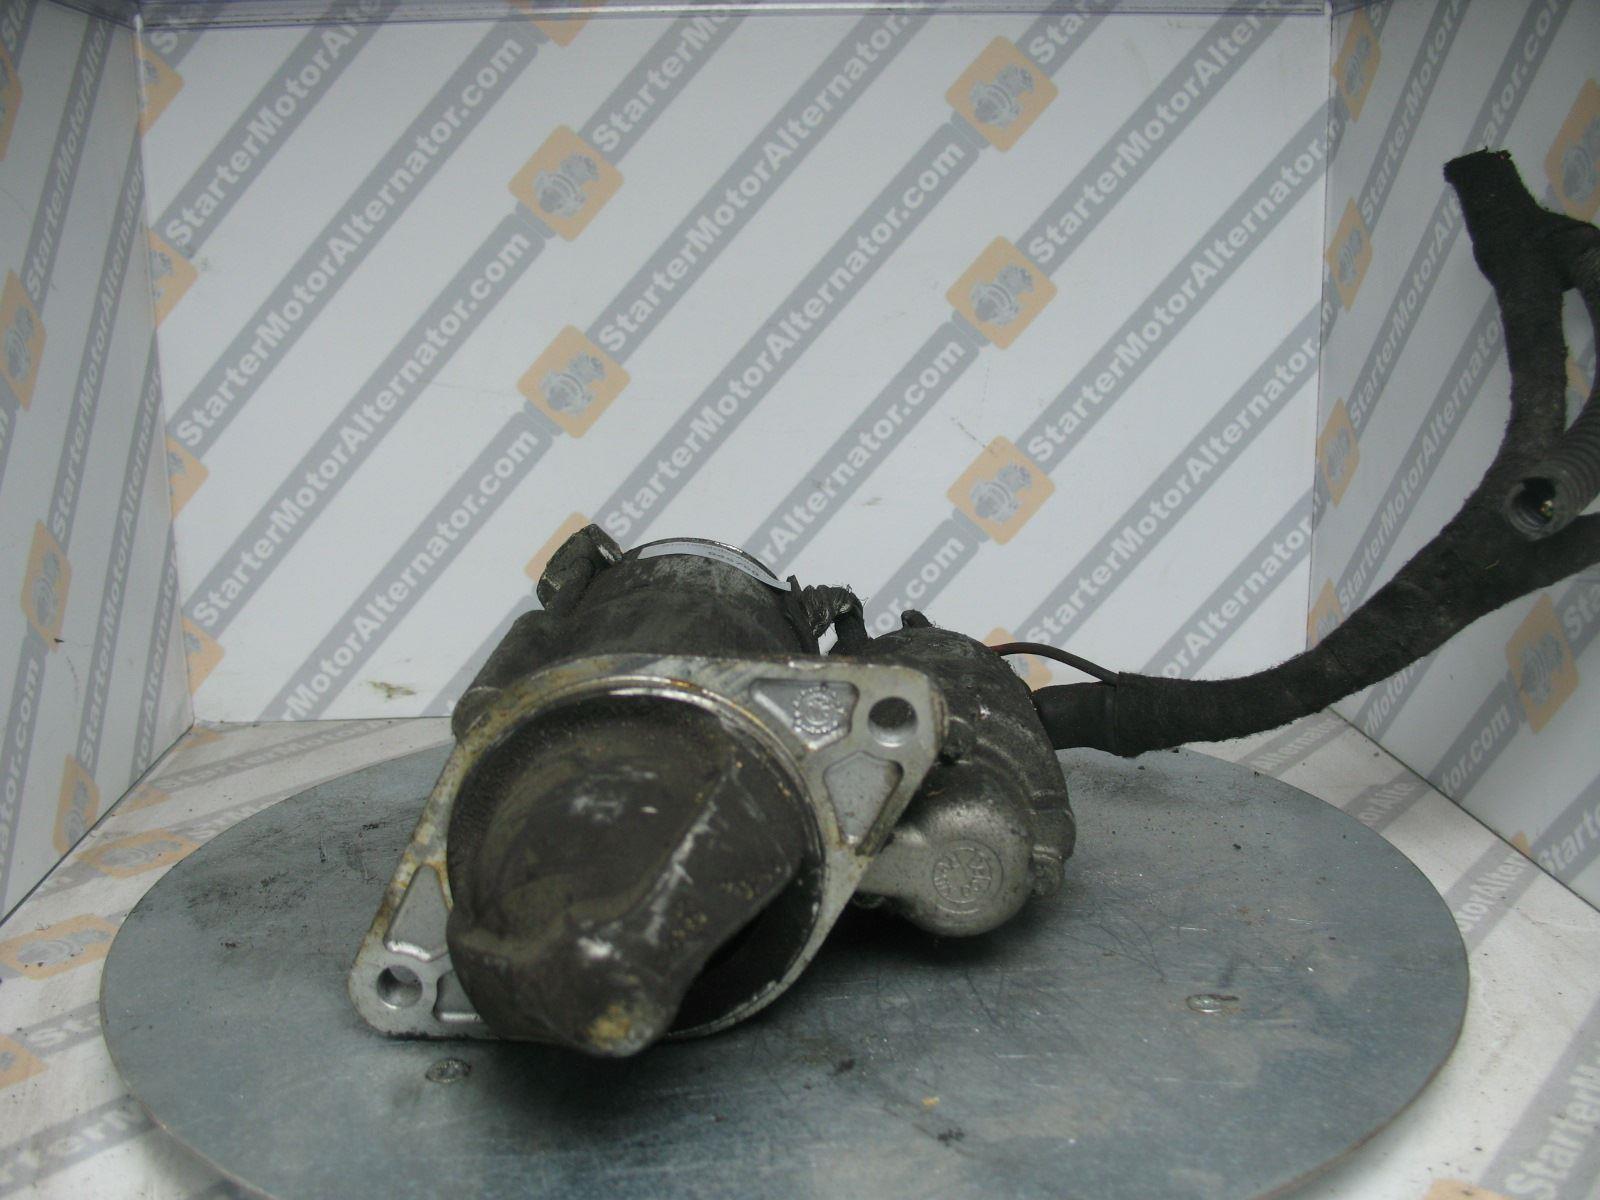 XIY2317 Starter Motor For Alfa Romeo / Chevrolet / Fiat / Opel / Saab / Vauxhall